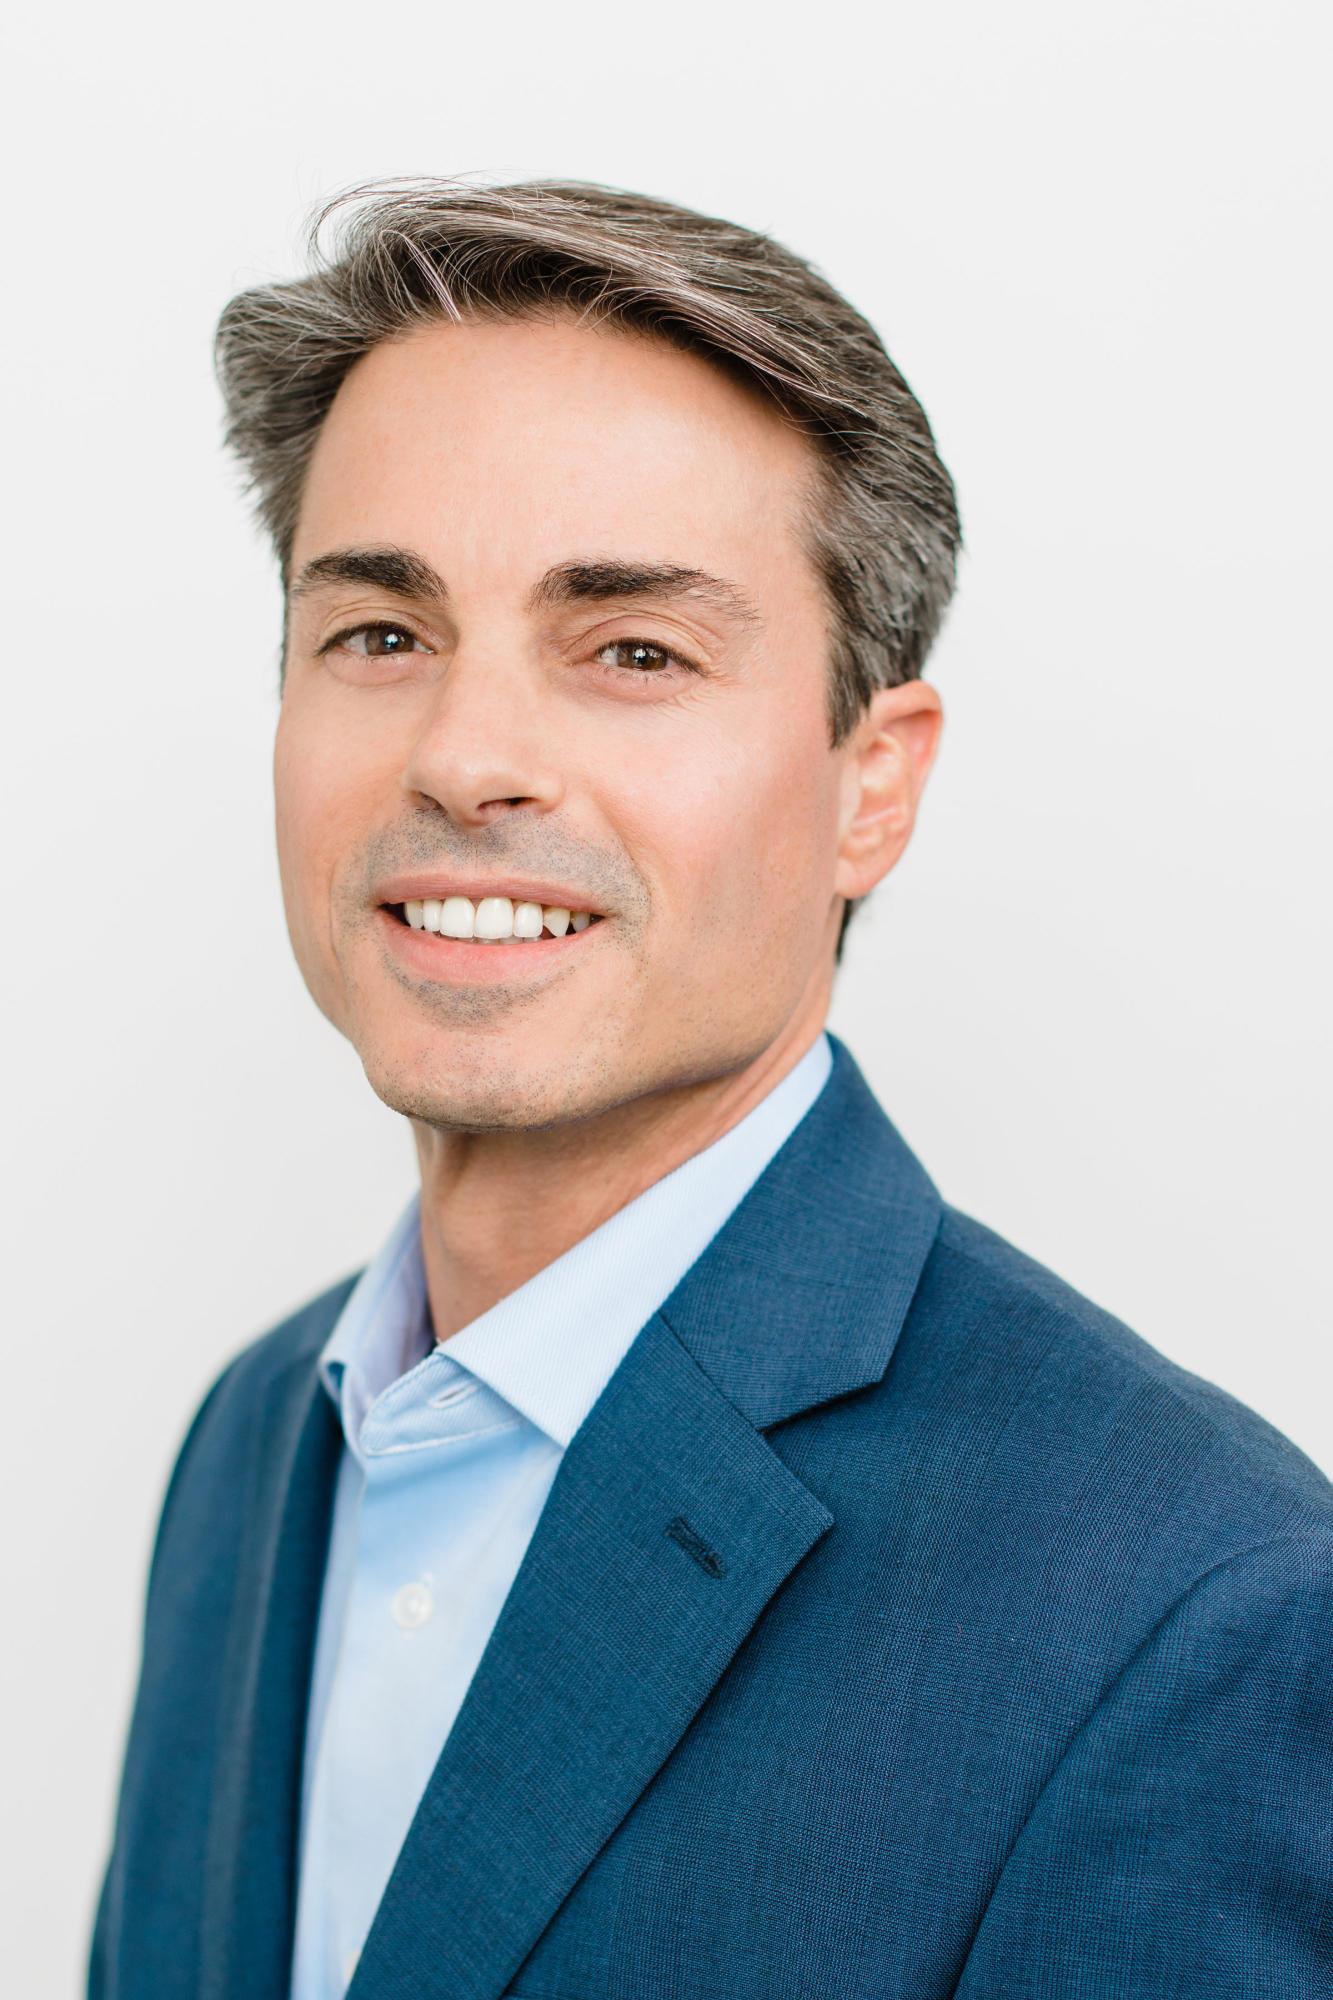 John Pedini Project Manager Director